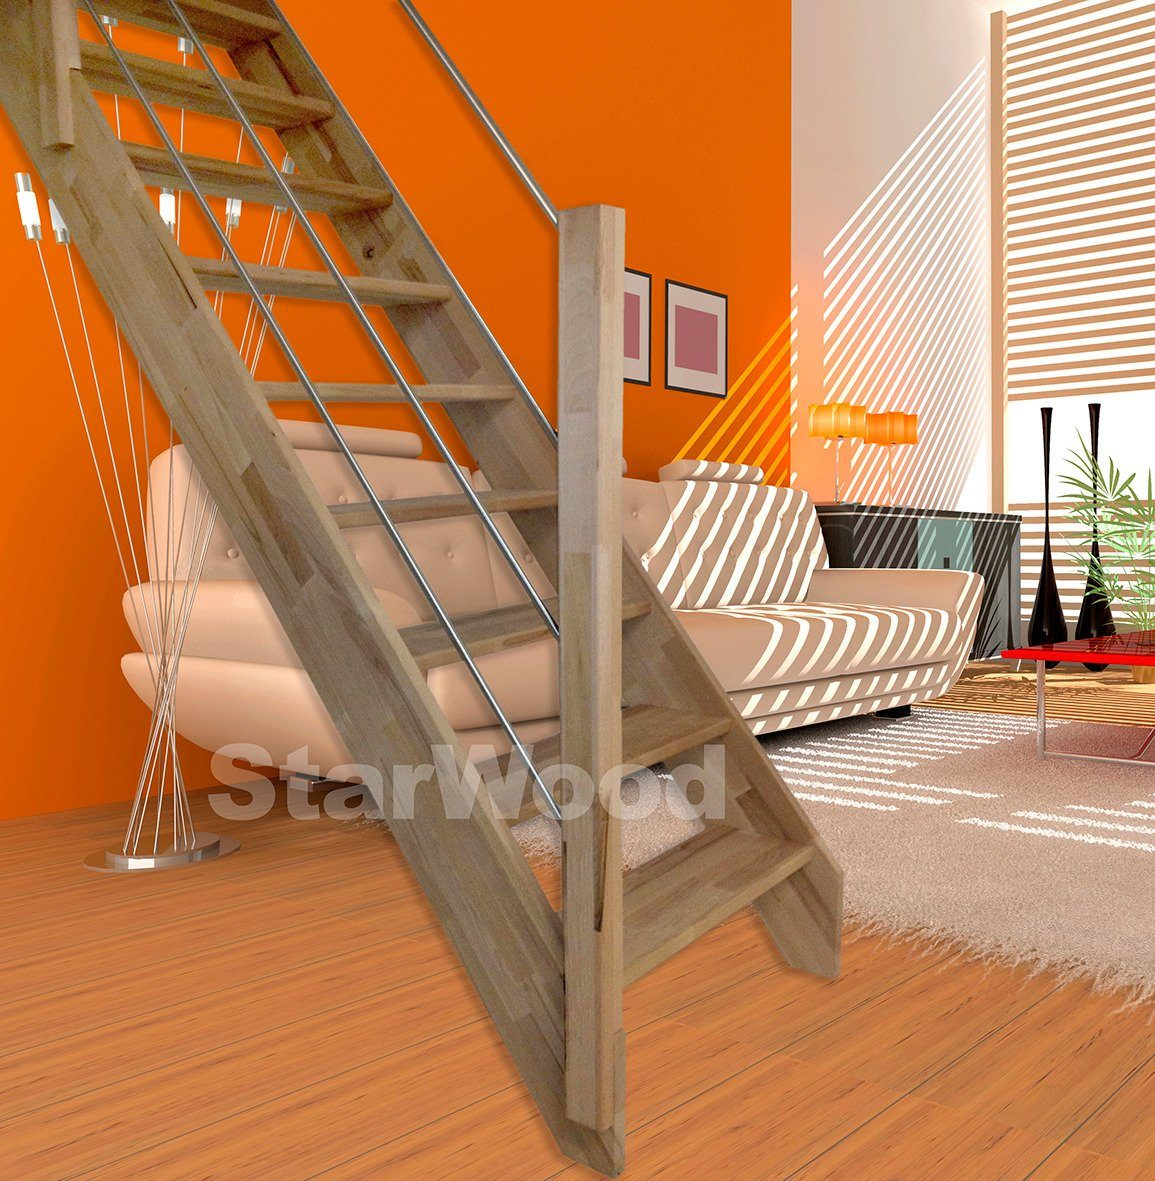 STARWOOD Raumspartreppe »Rhodos«, offene Stufen, gerade, Holz-Edelstahlgeländer links